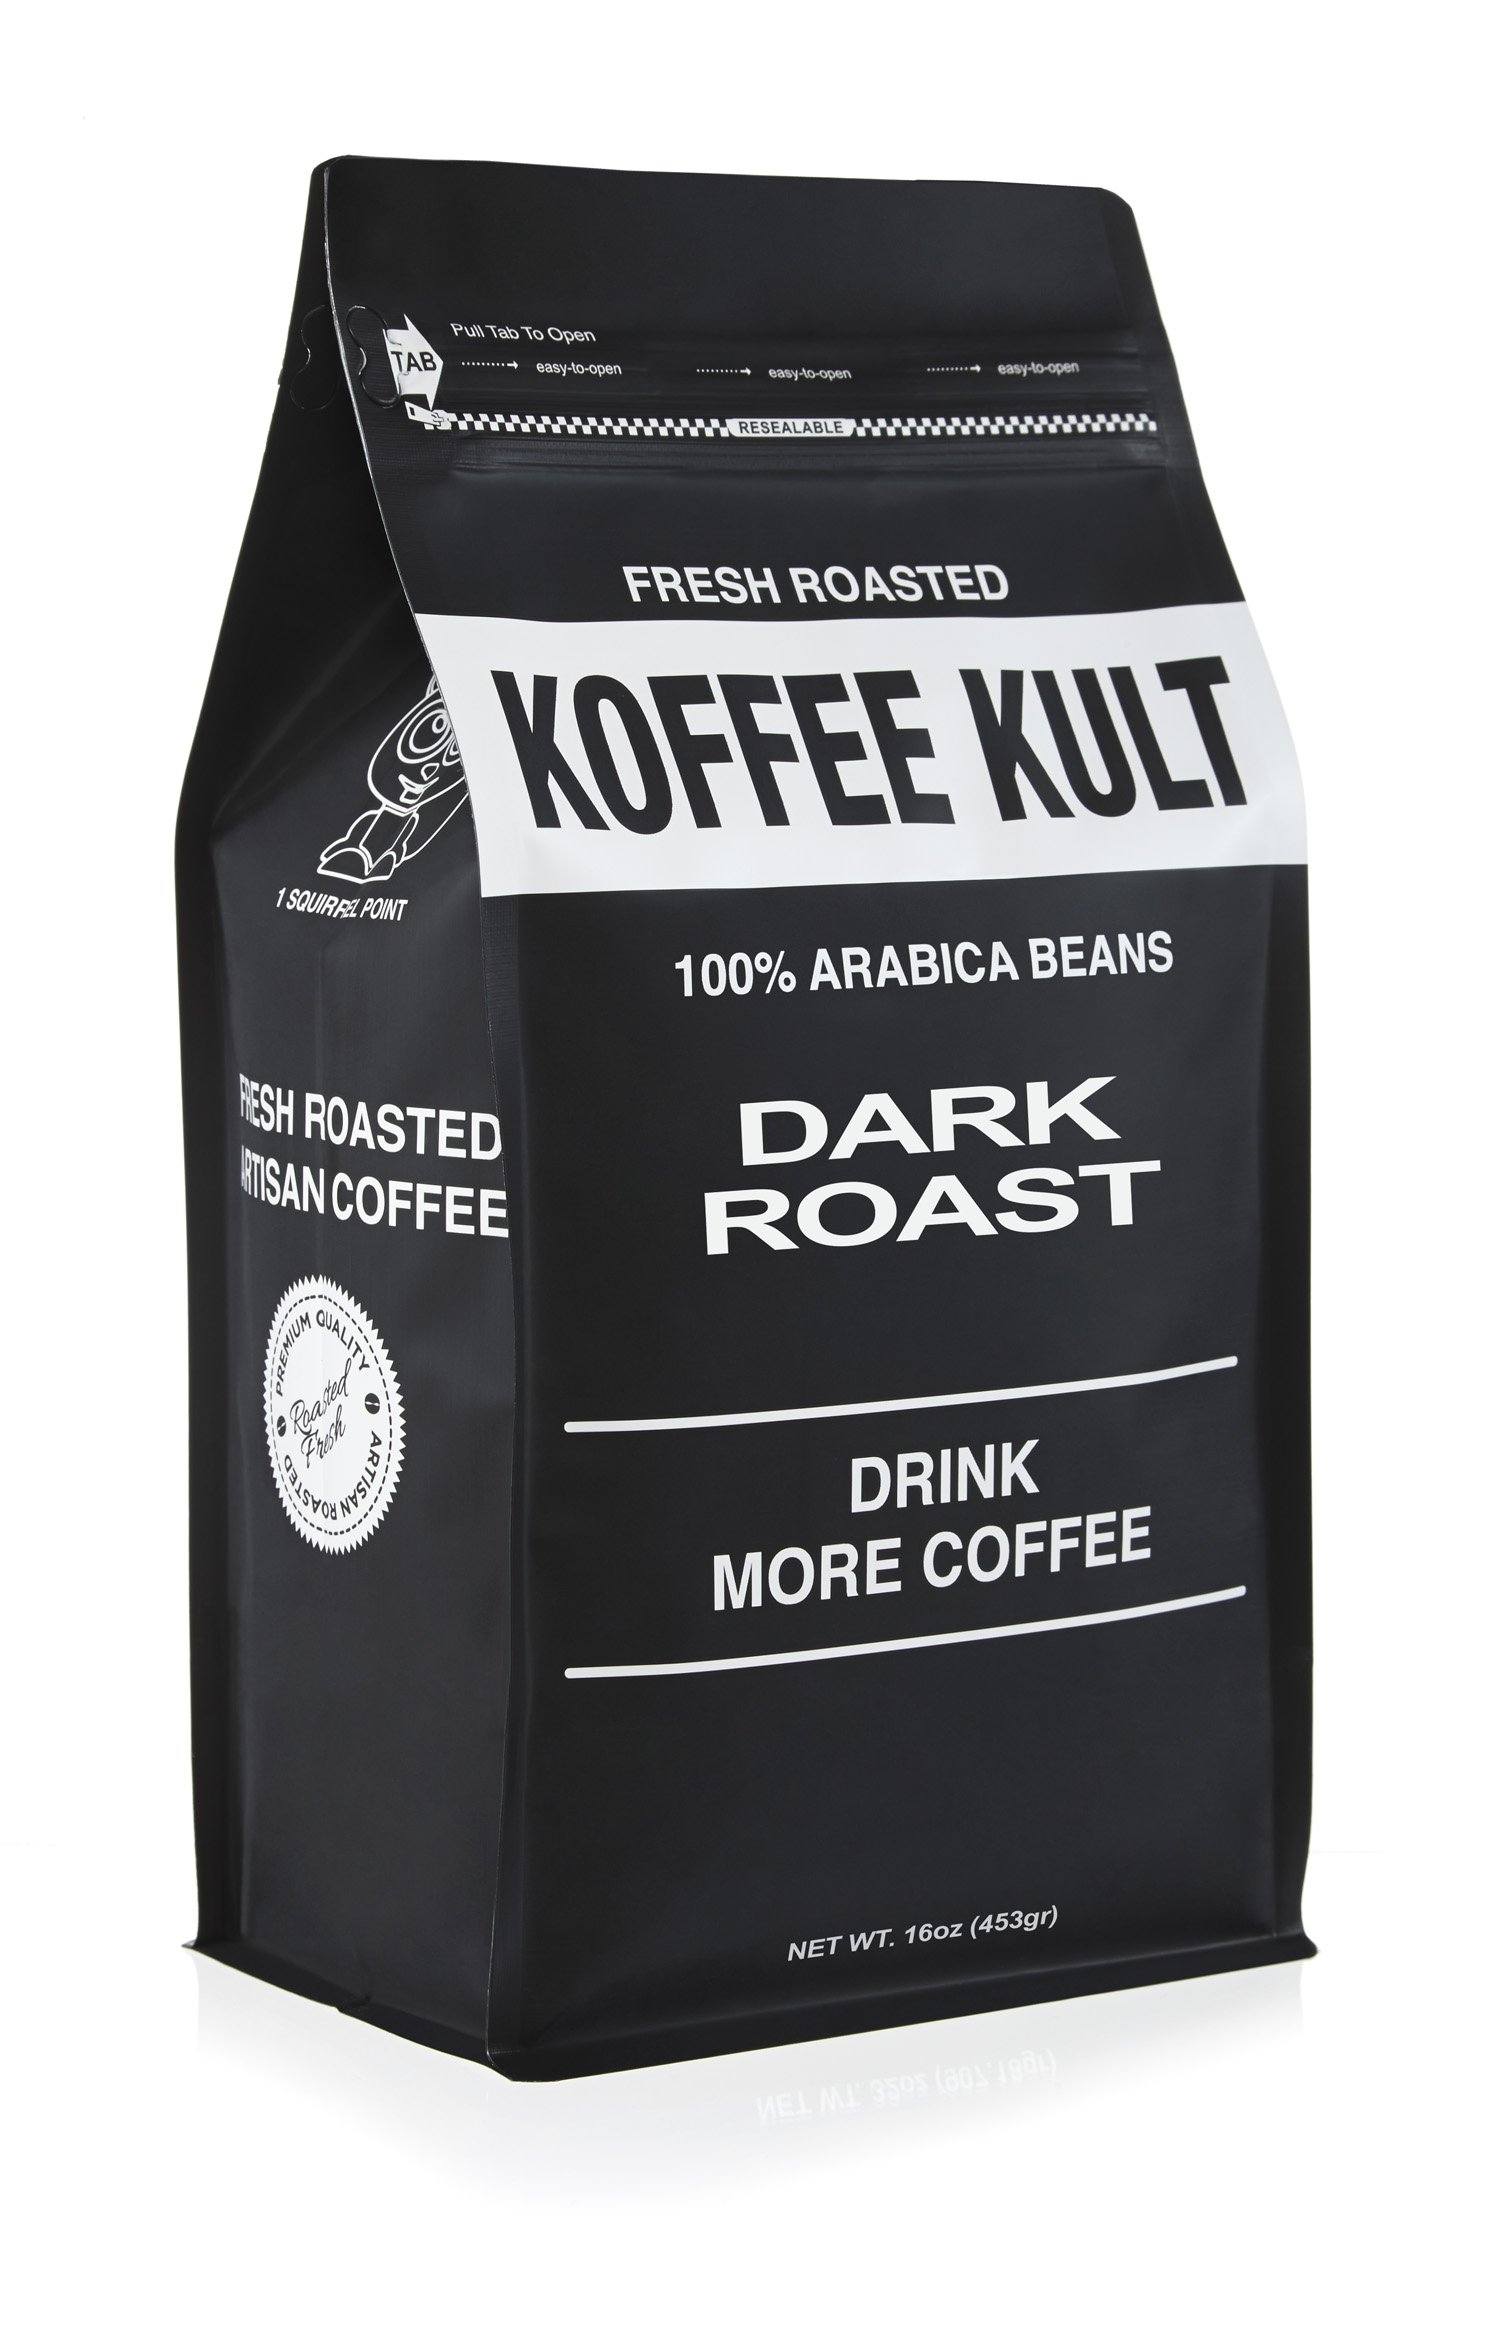 Koffee Kult DARK ROAST COFFEE (16oz) Highest Quality Delicious Specialty Grade Whole Bean Coffee - Fresh Gourmet Aromatic Artisan Blend